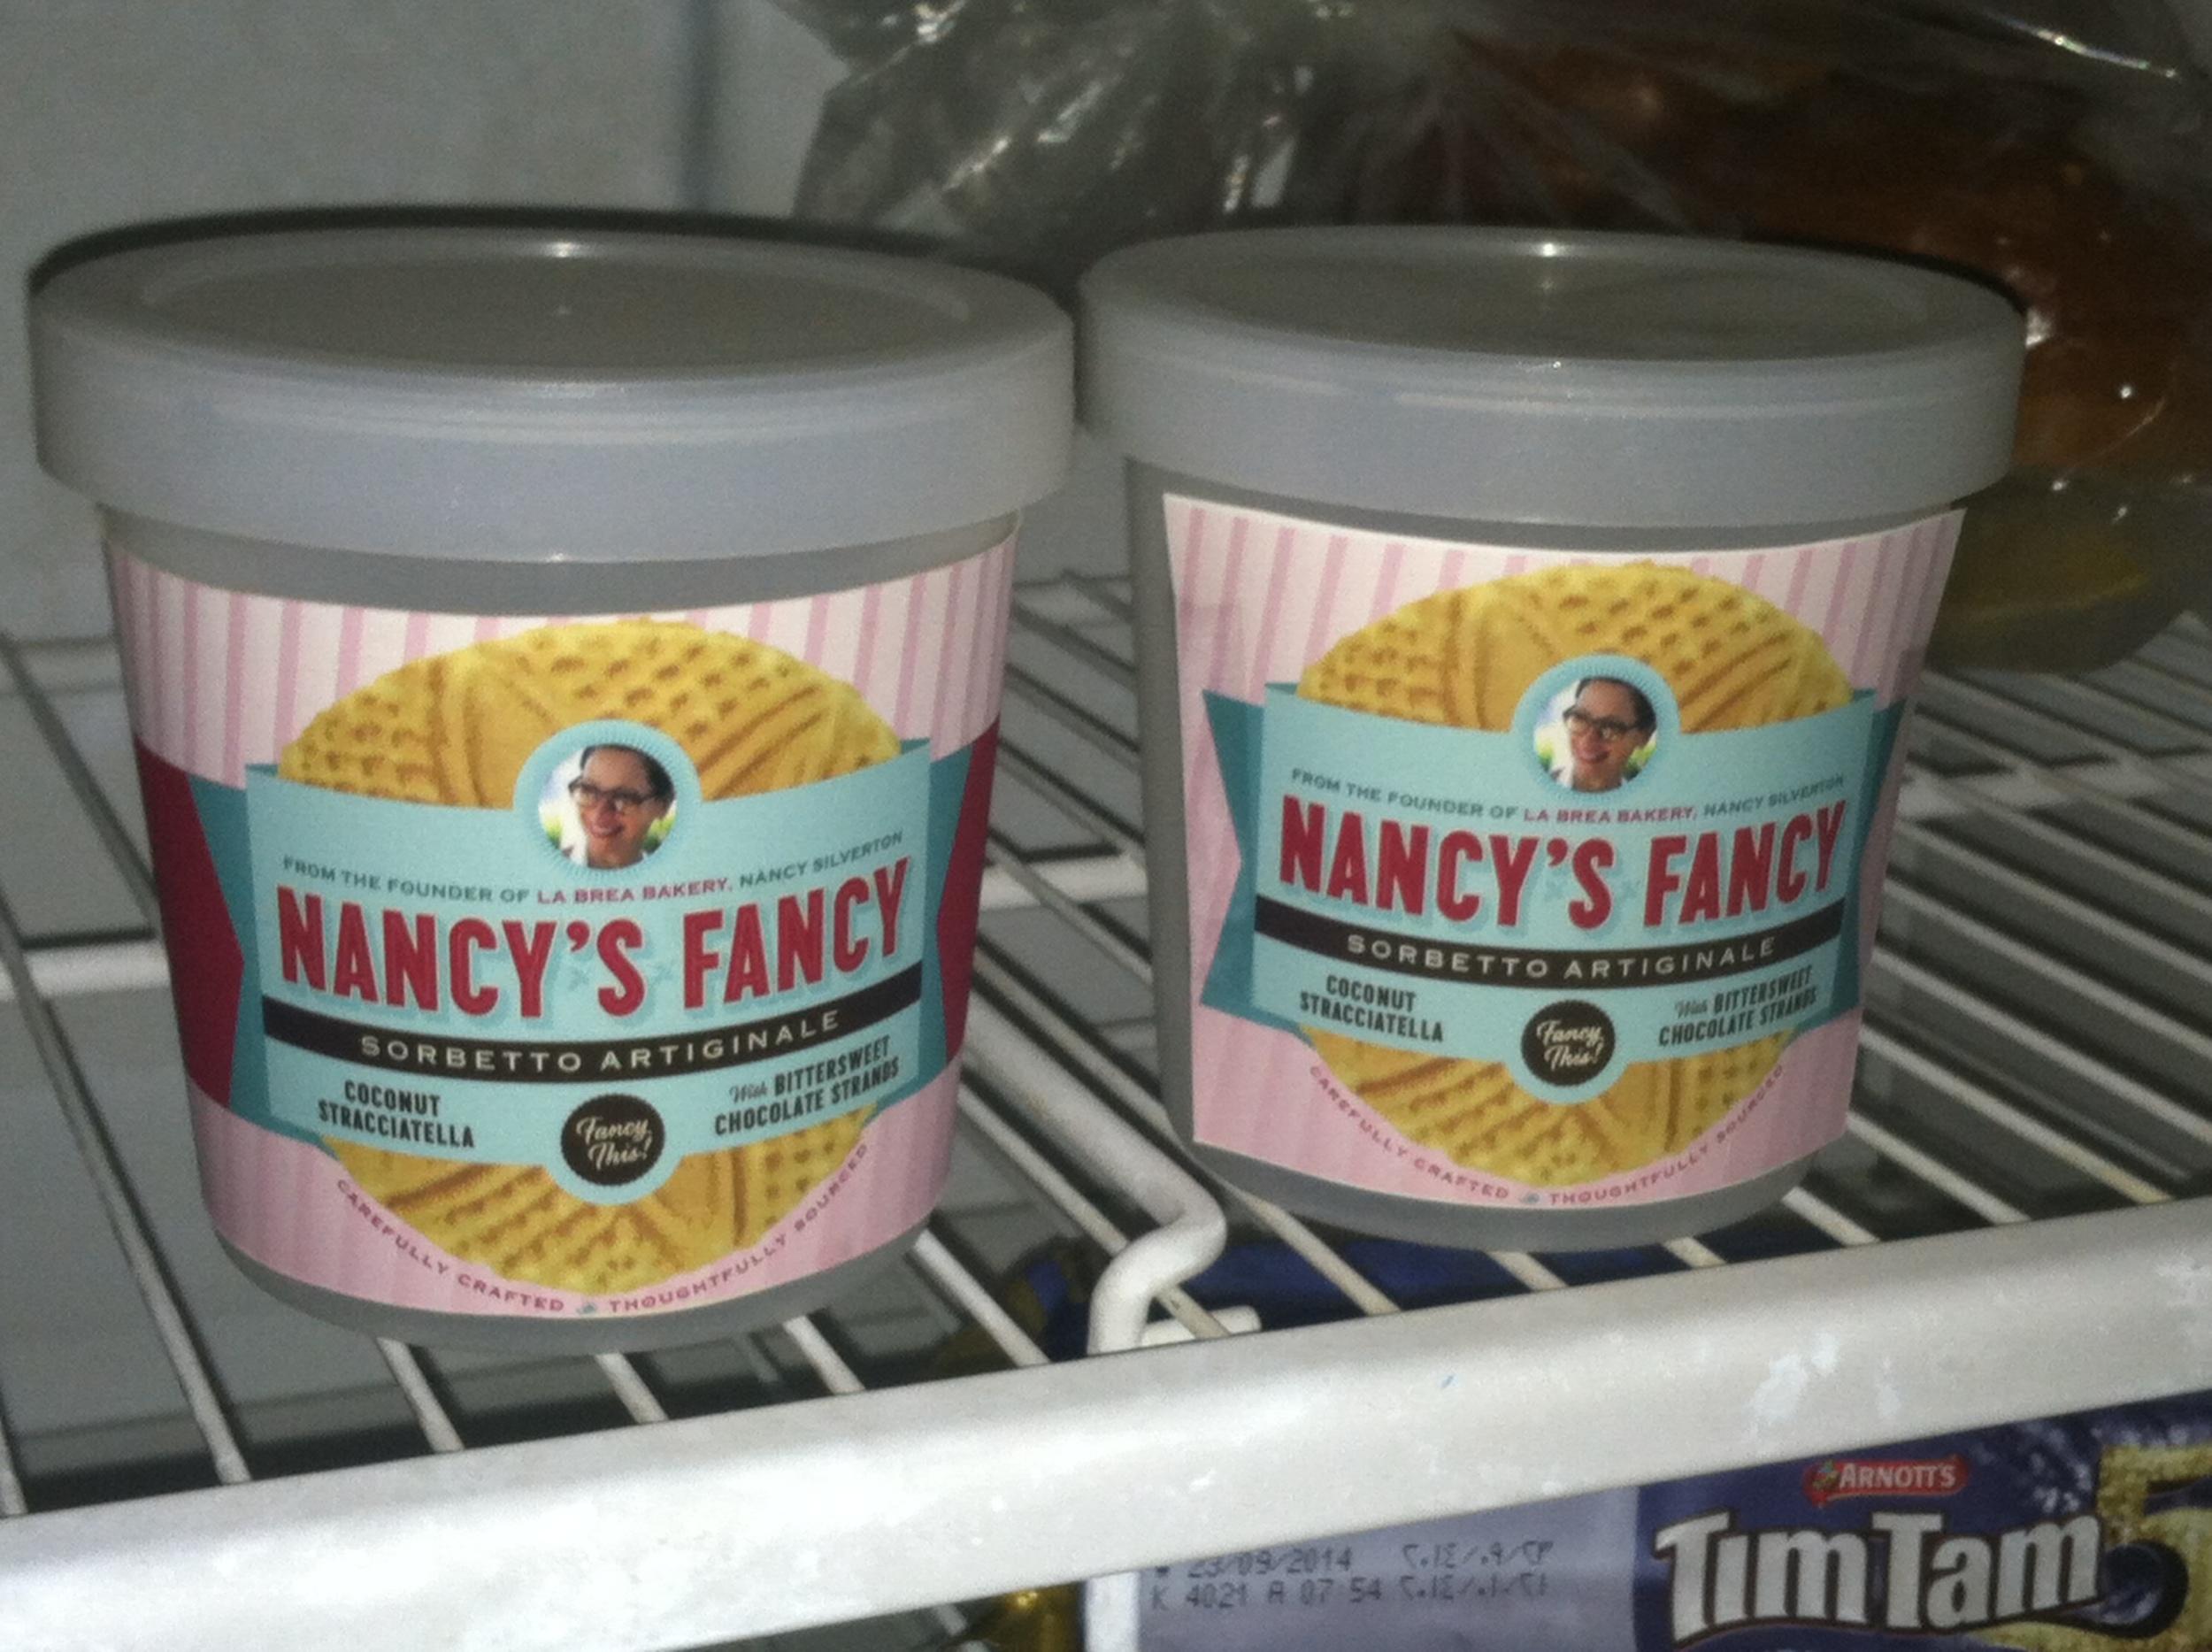 "A spokesman for Tim tam said ""That's one classy ass freezer."""